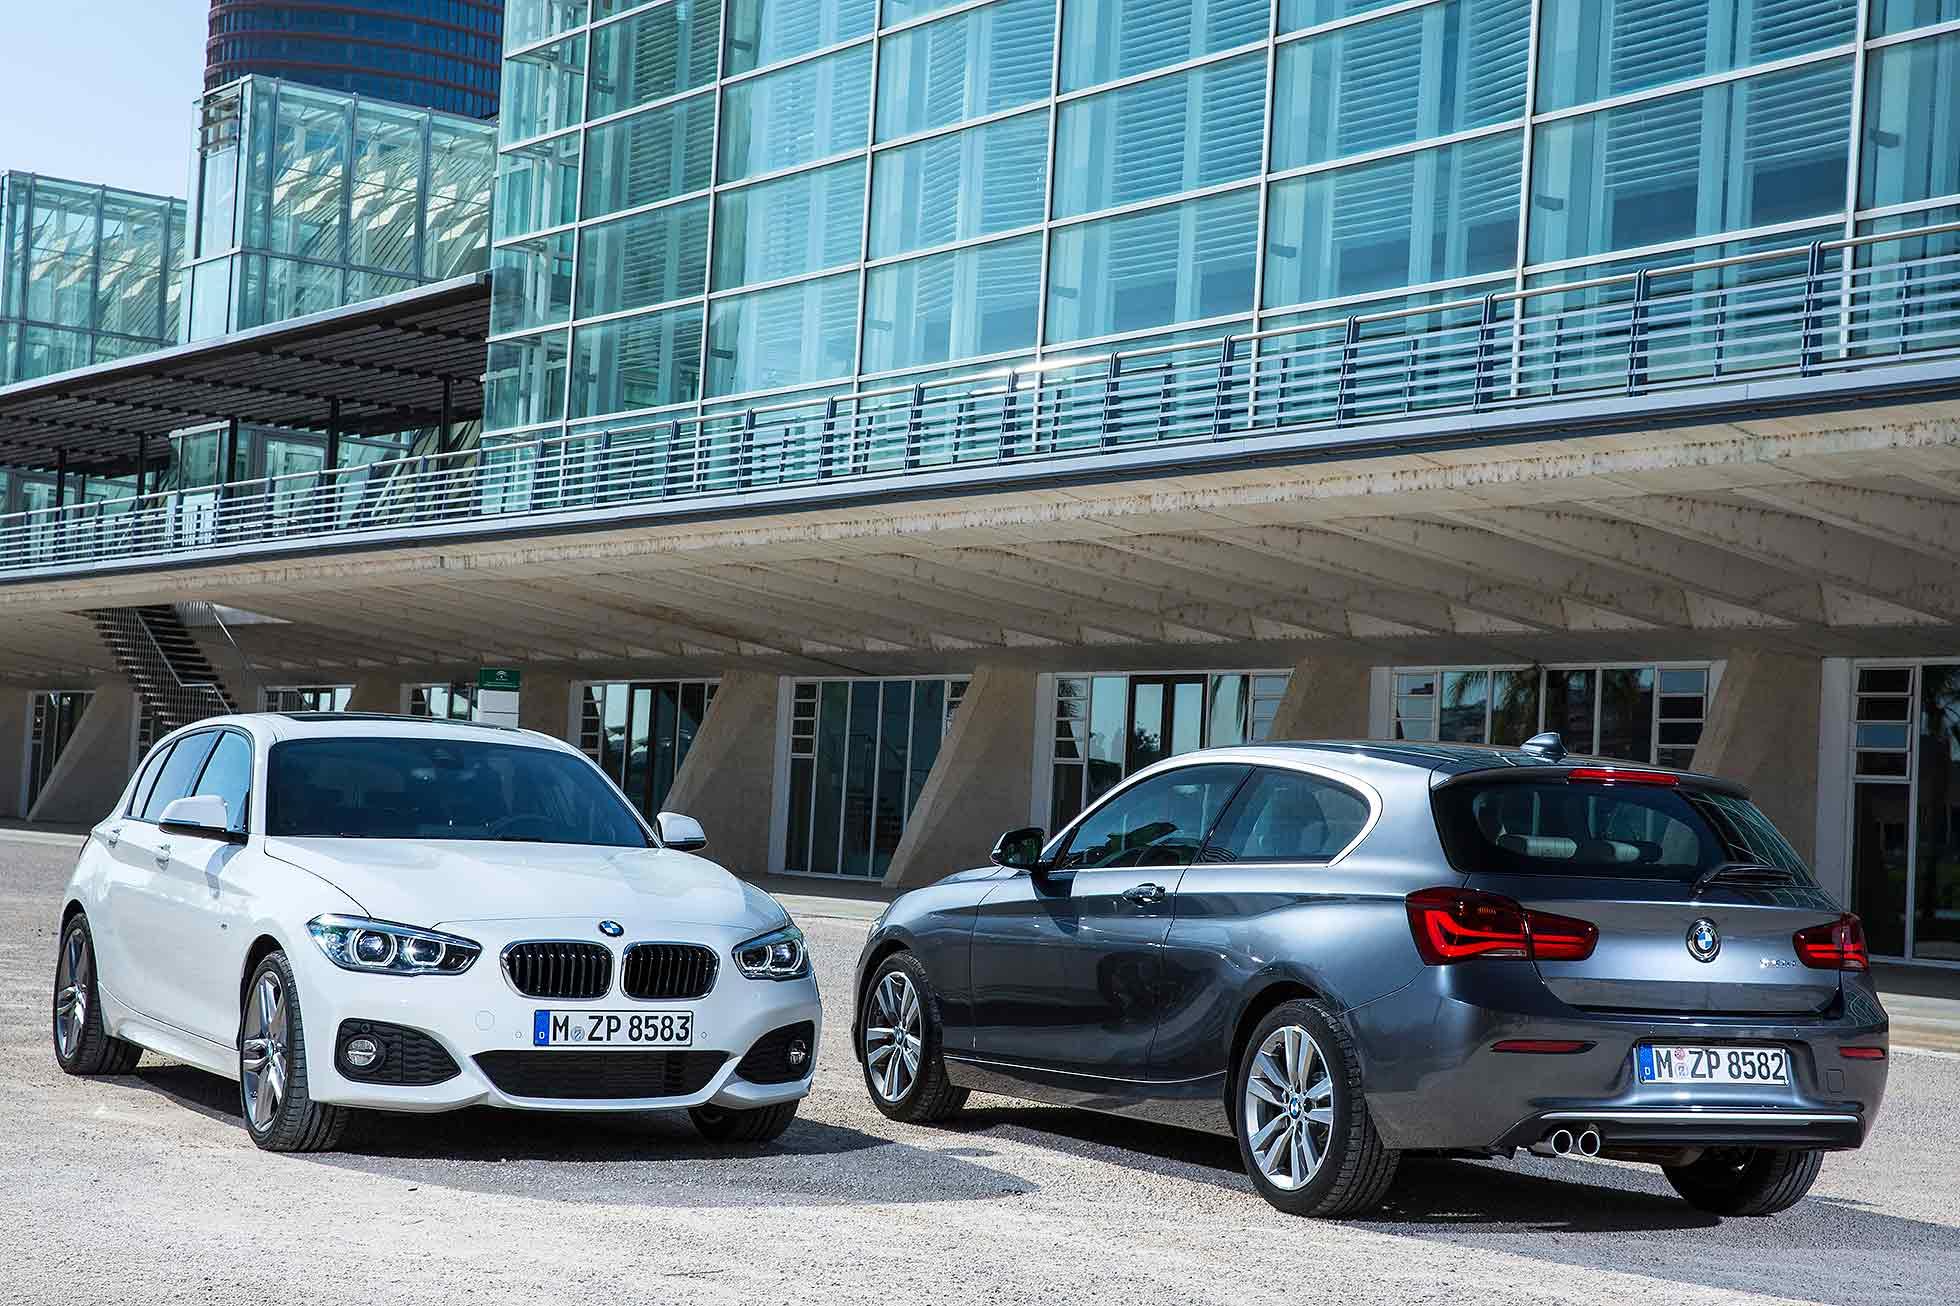 BMW 1 Series (2015)